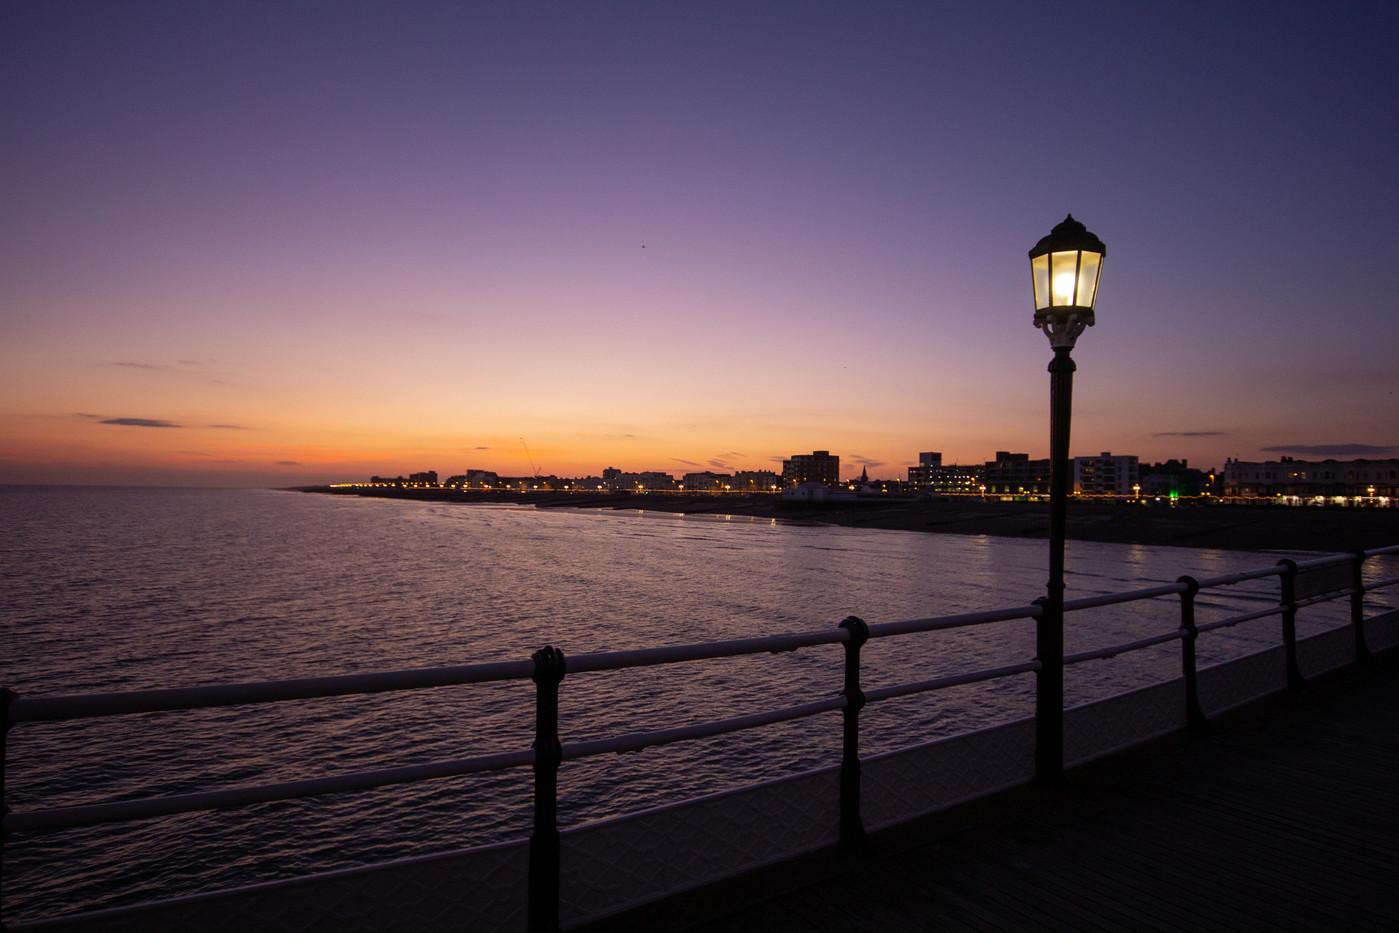 Sunset on Worthing Pier